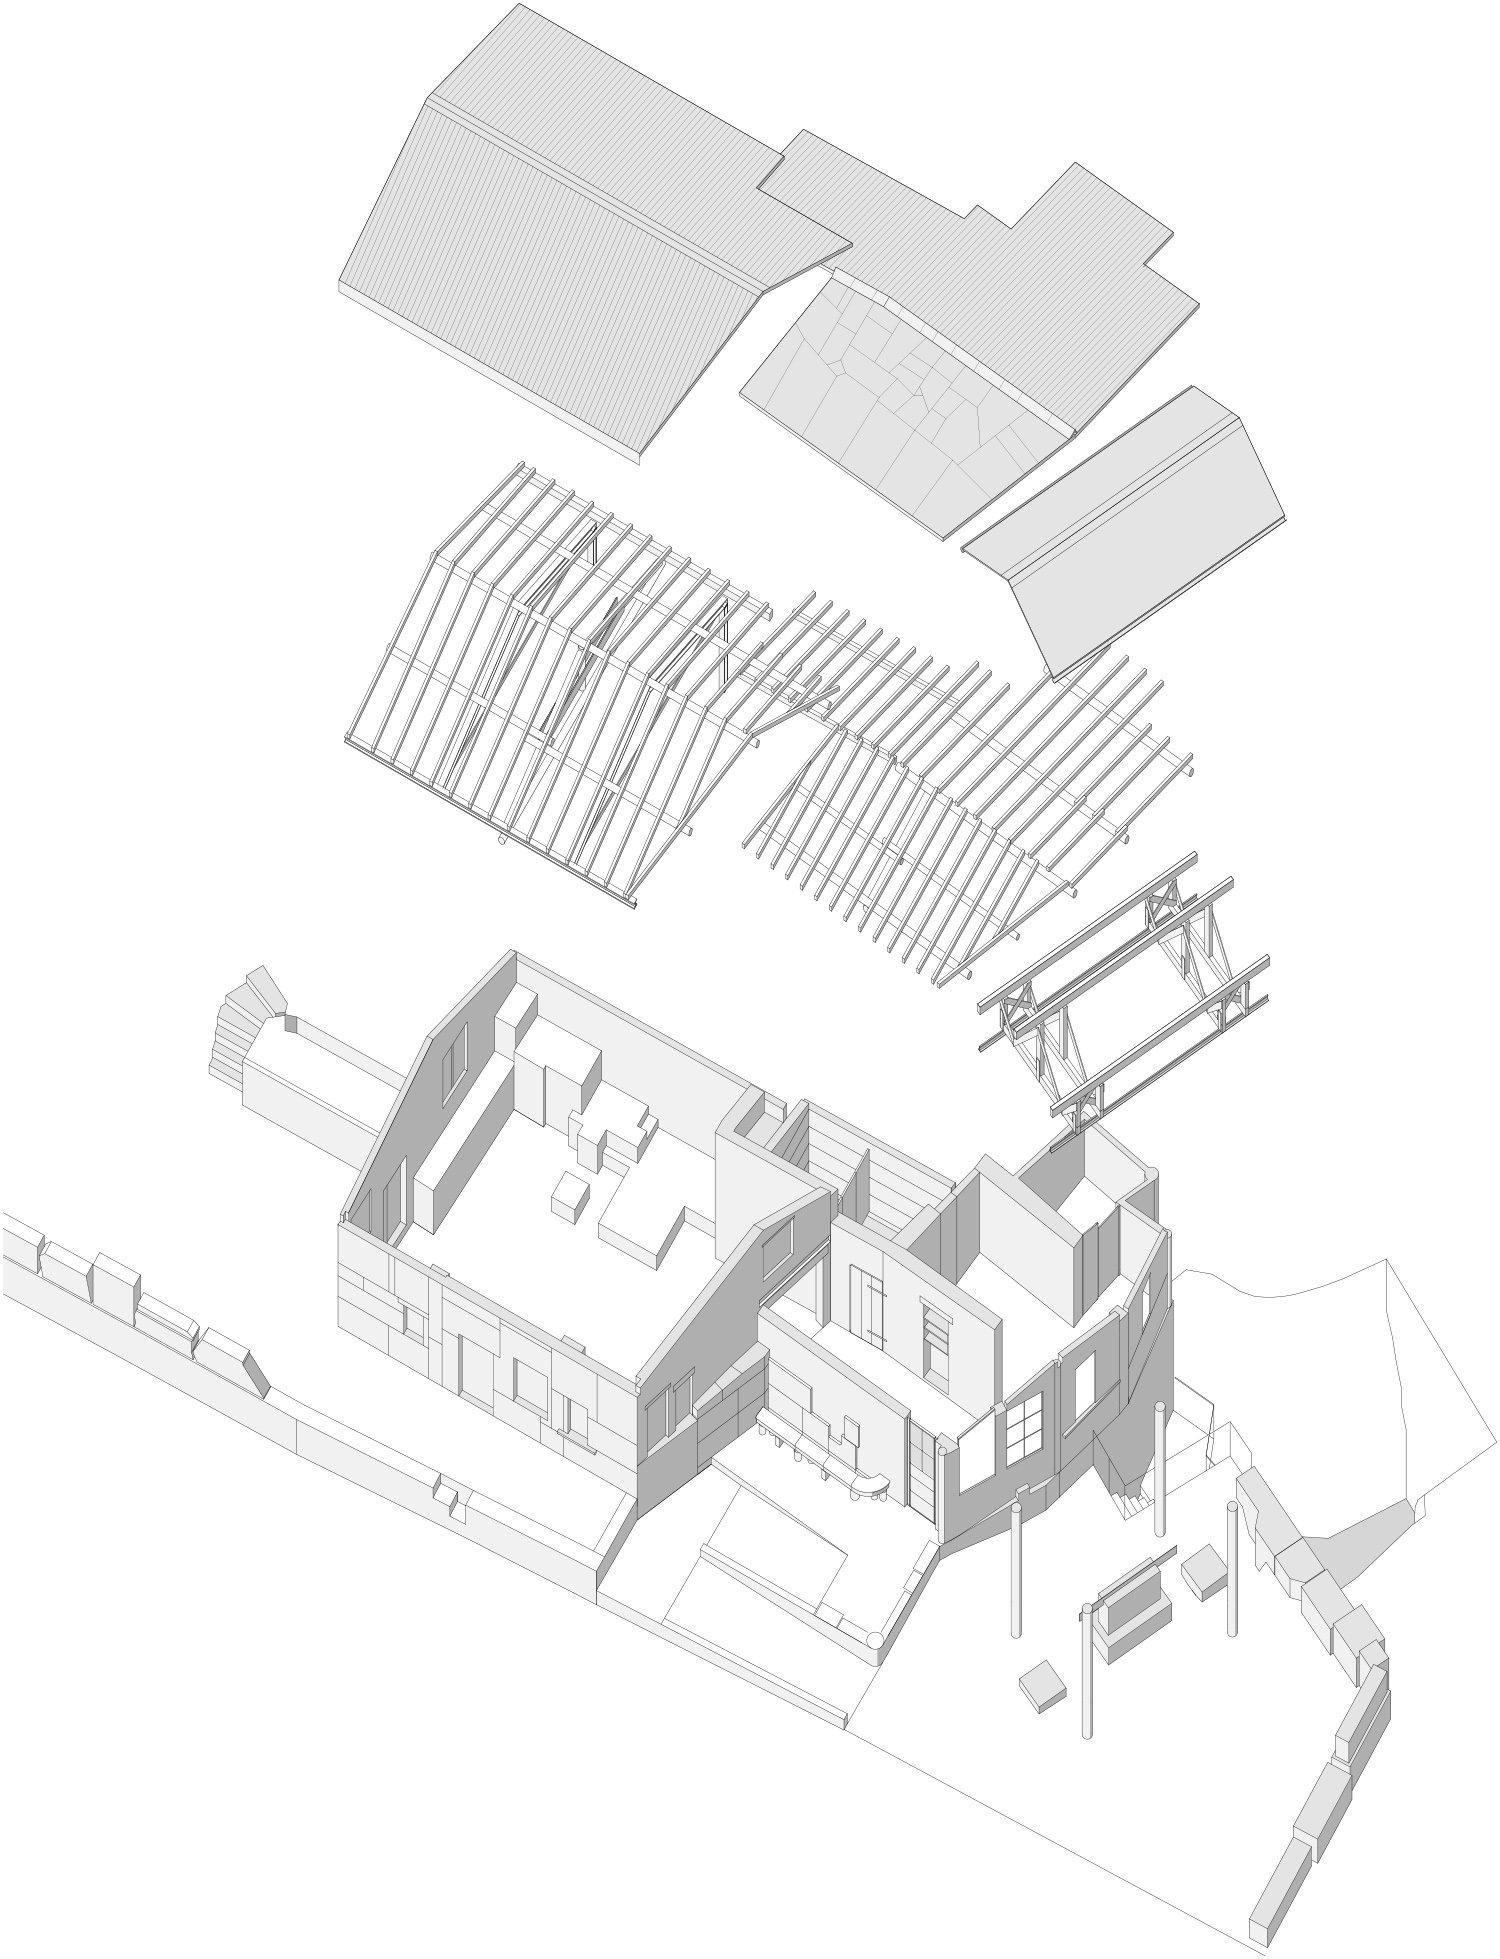 Quarry Workshop_axonometry Enrico Sassi Architetto}